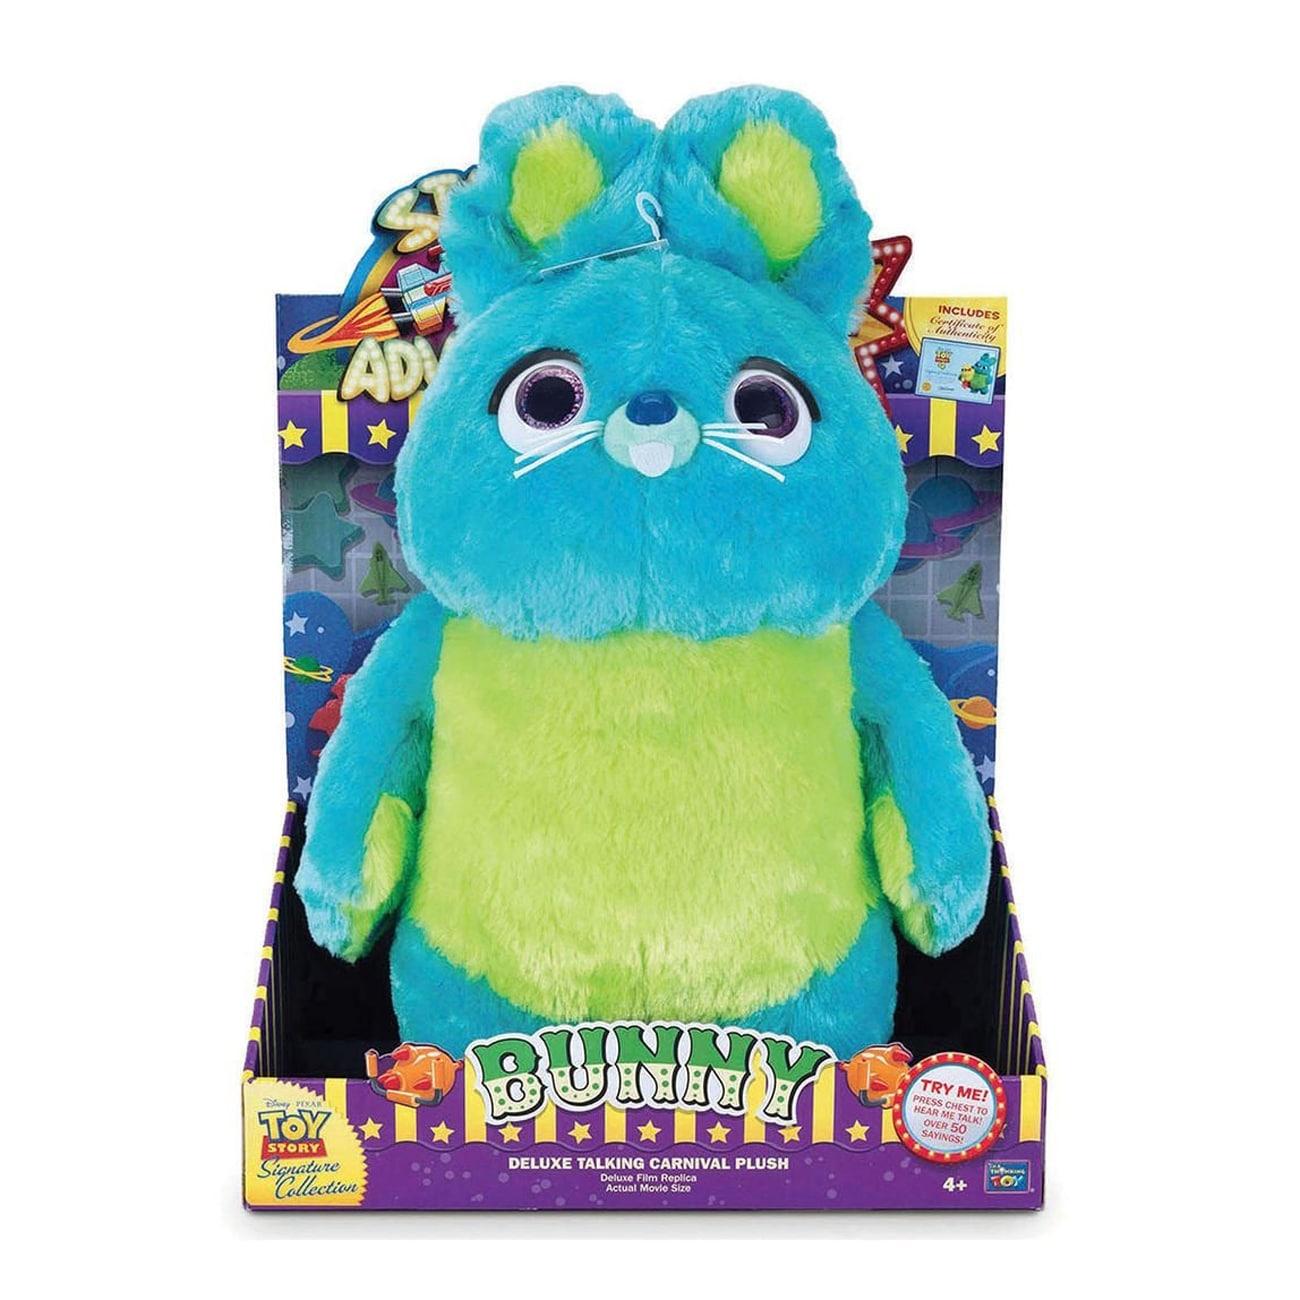 Disney Pixar Toy Story Signature Collection Bullseye Deluxe Movie Replica Toy